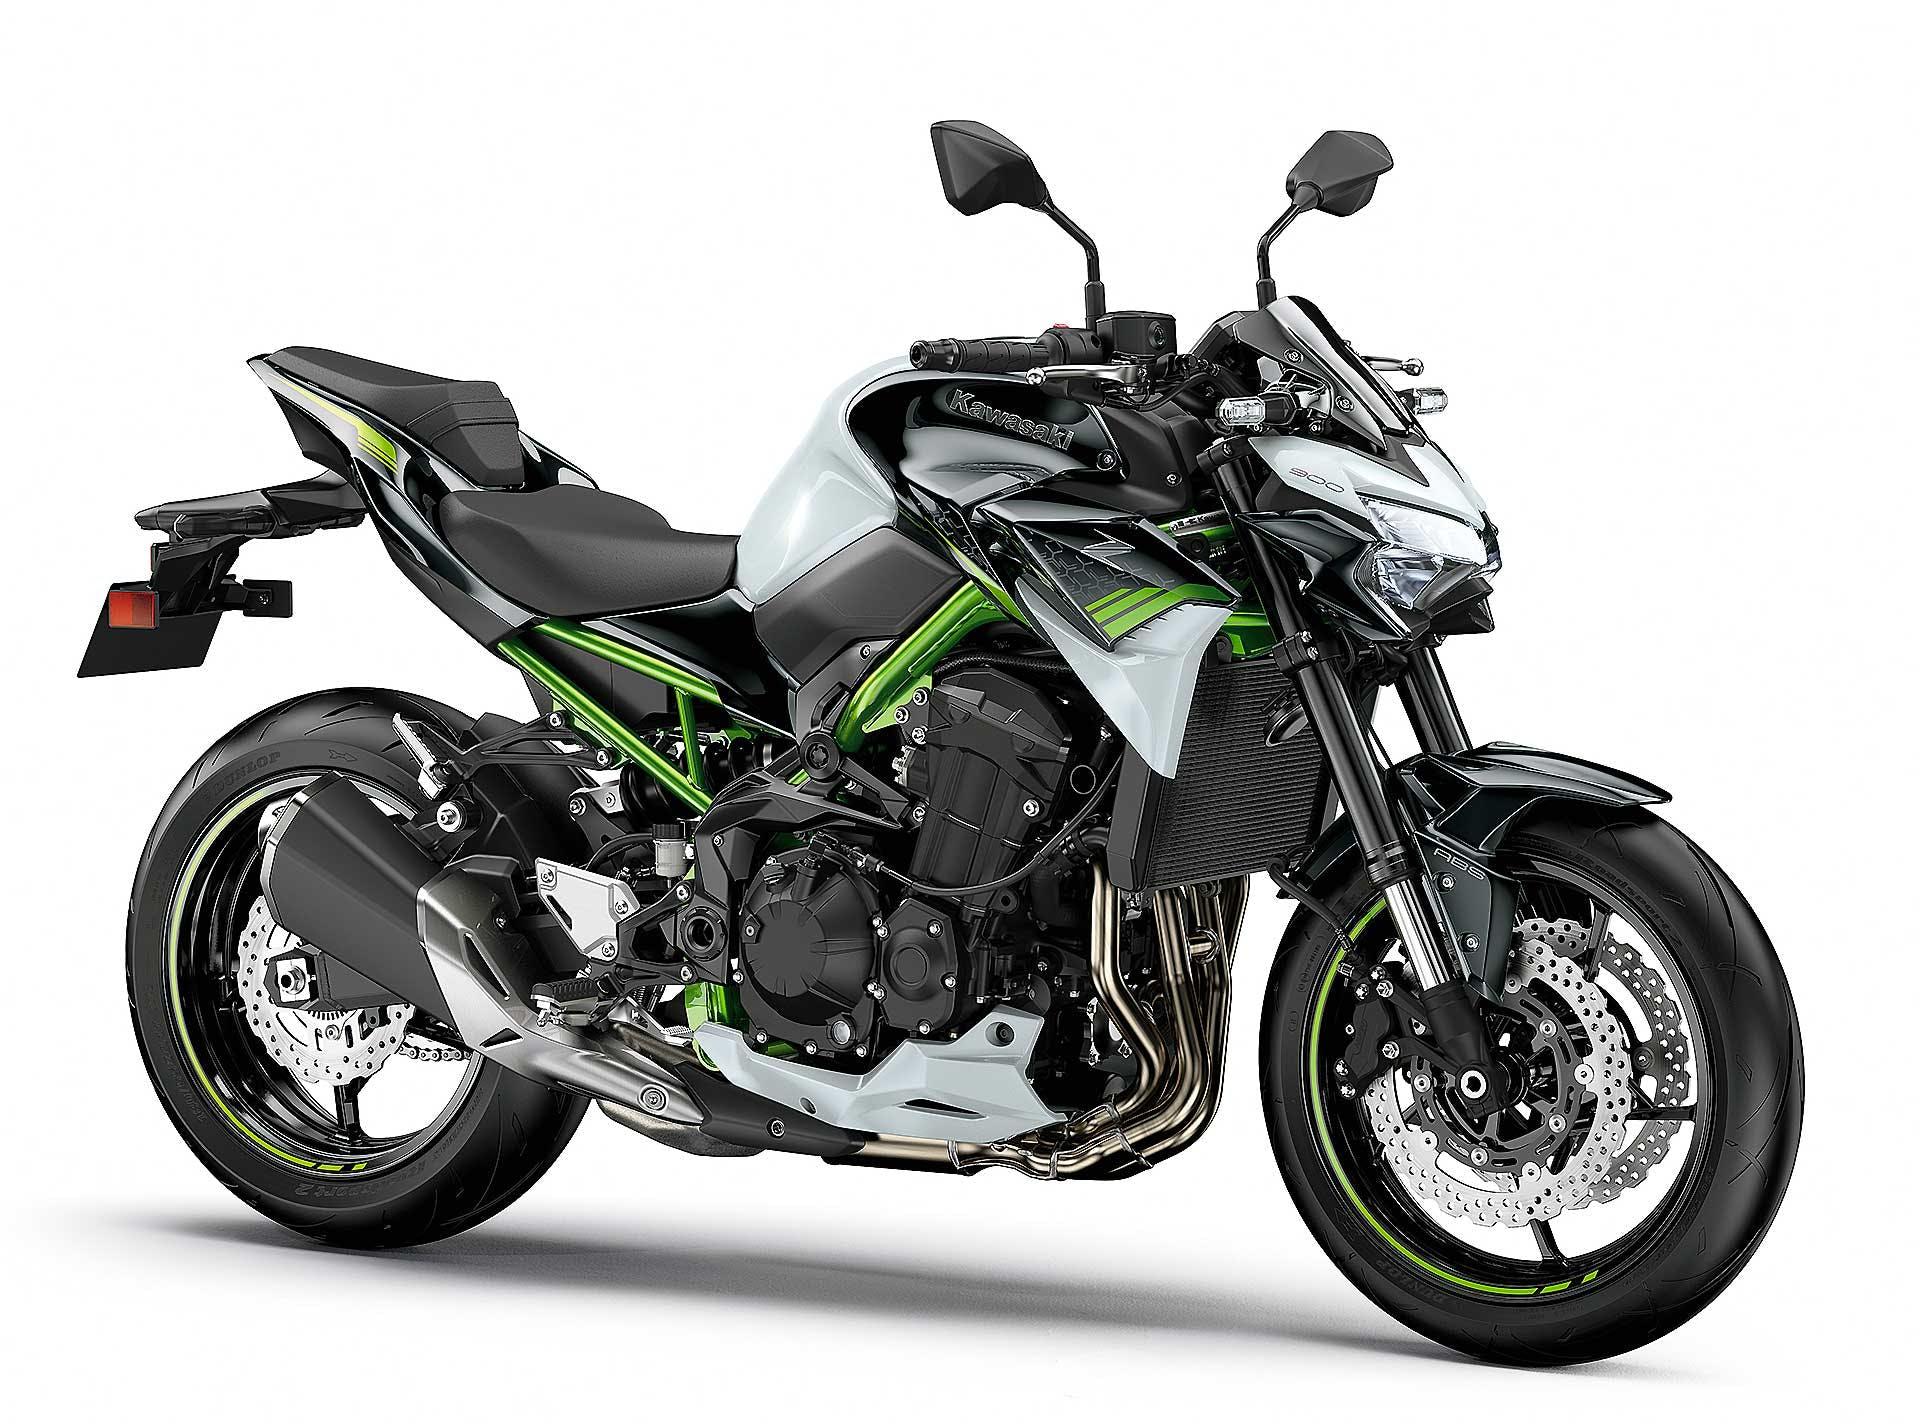 Prova Kawasaki Z900 2020 moto verde studio fondo bianco